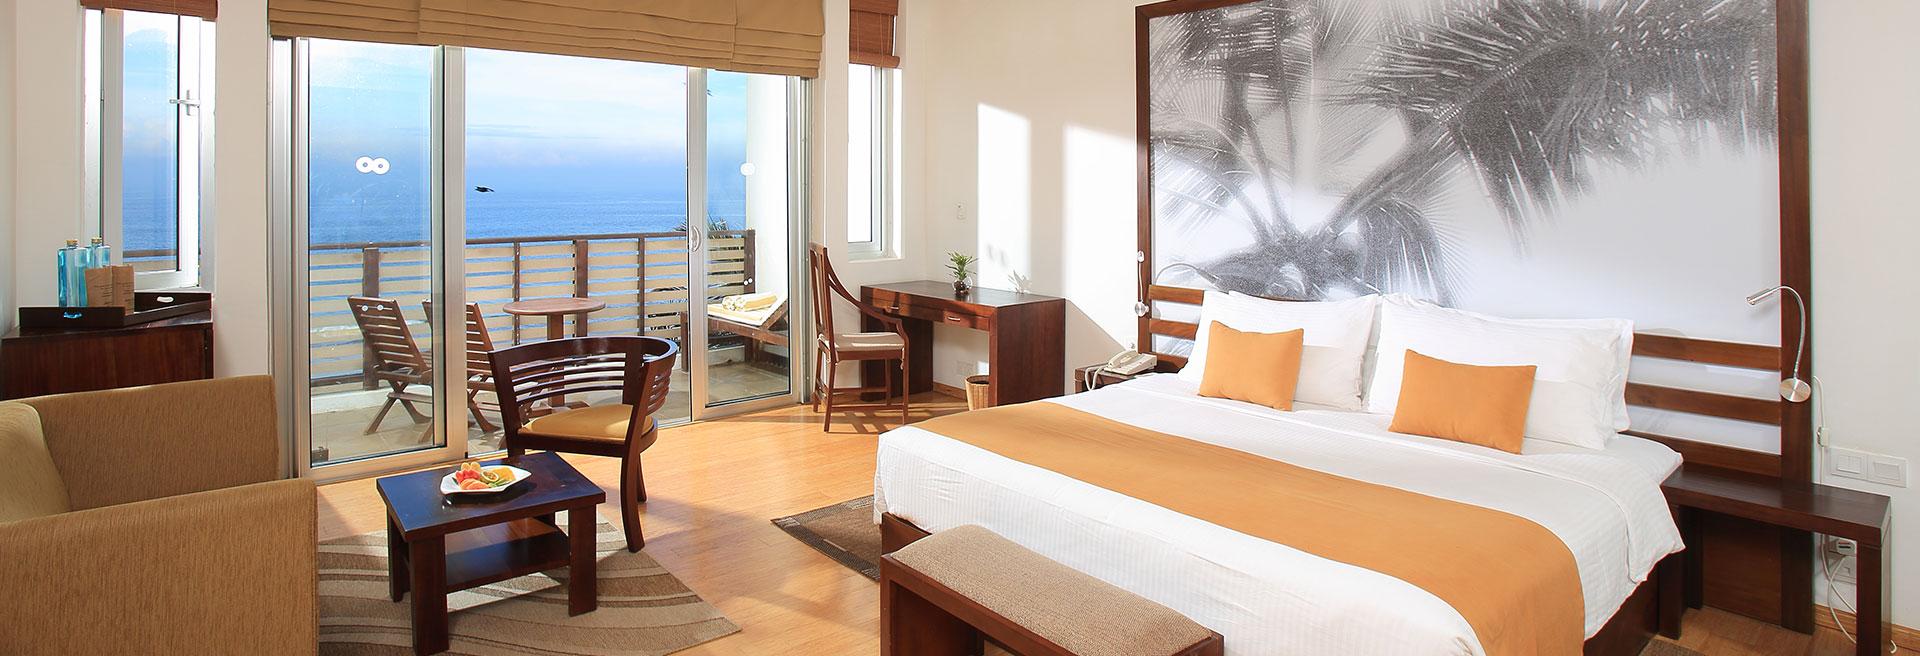 Luxury Double Bedroom With Beachside View